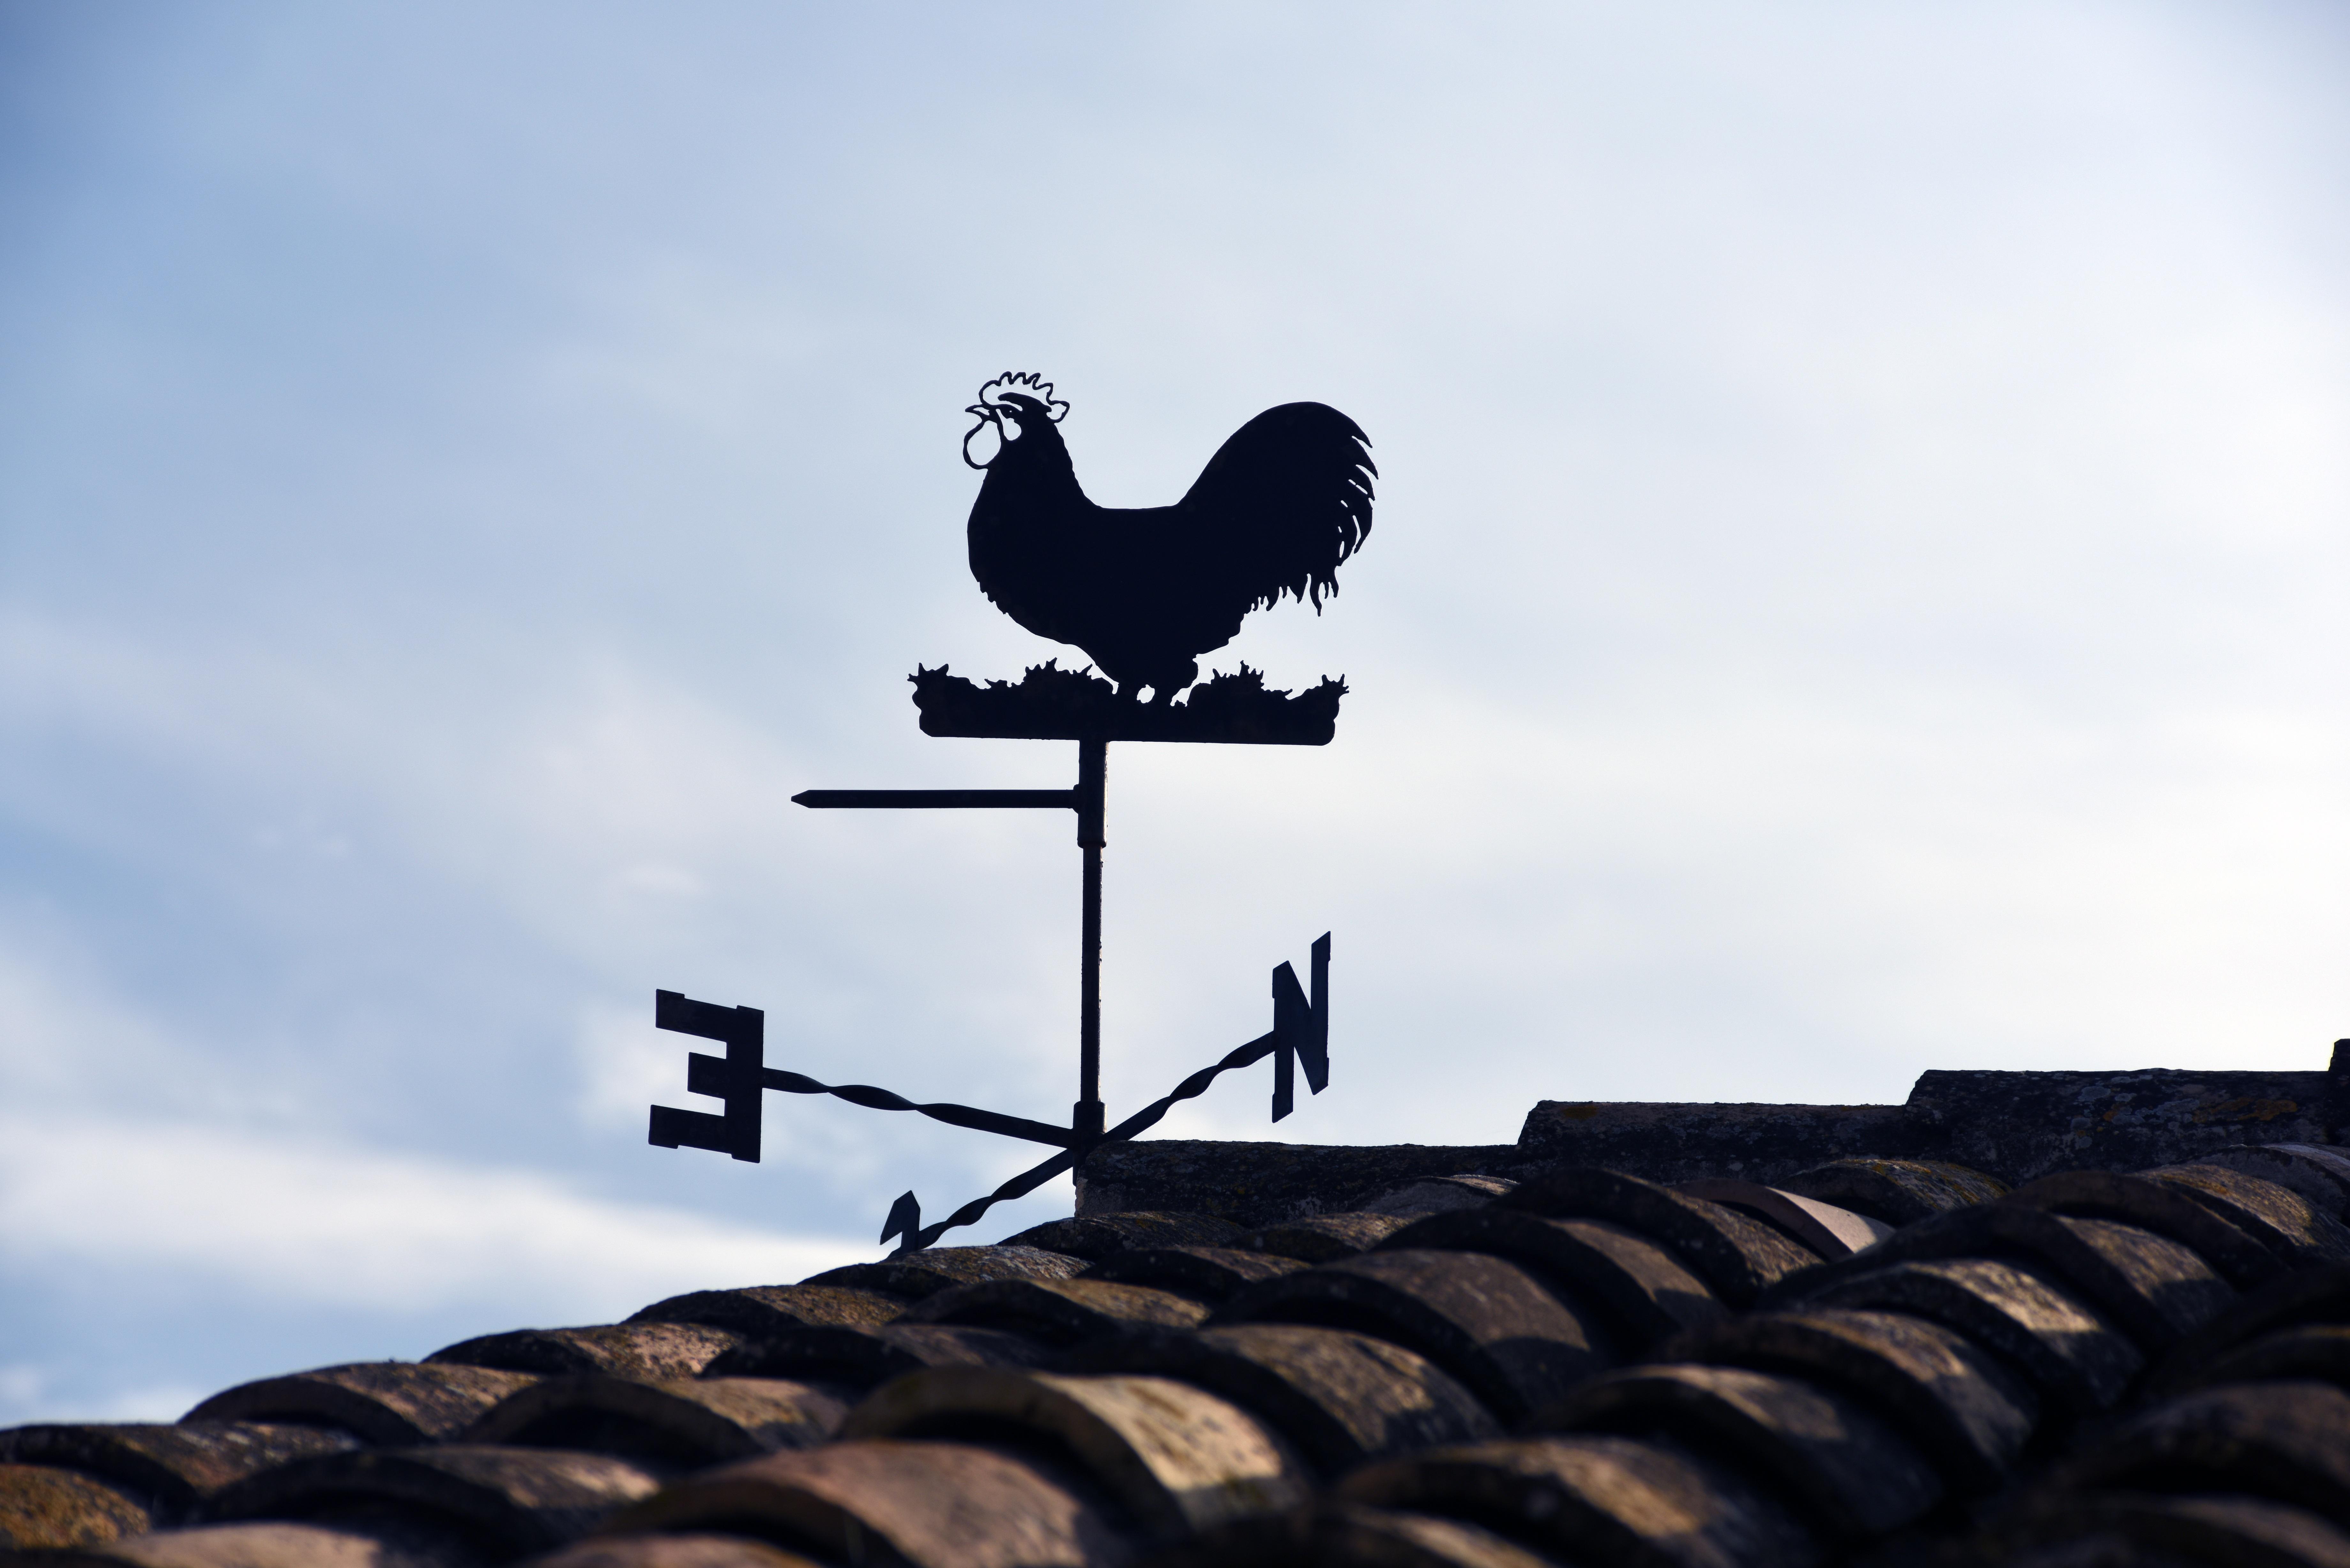 Wind Vane Beside Roof · Free Stock Photo